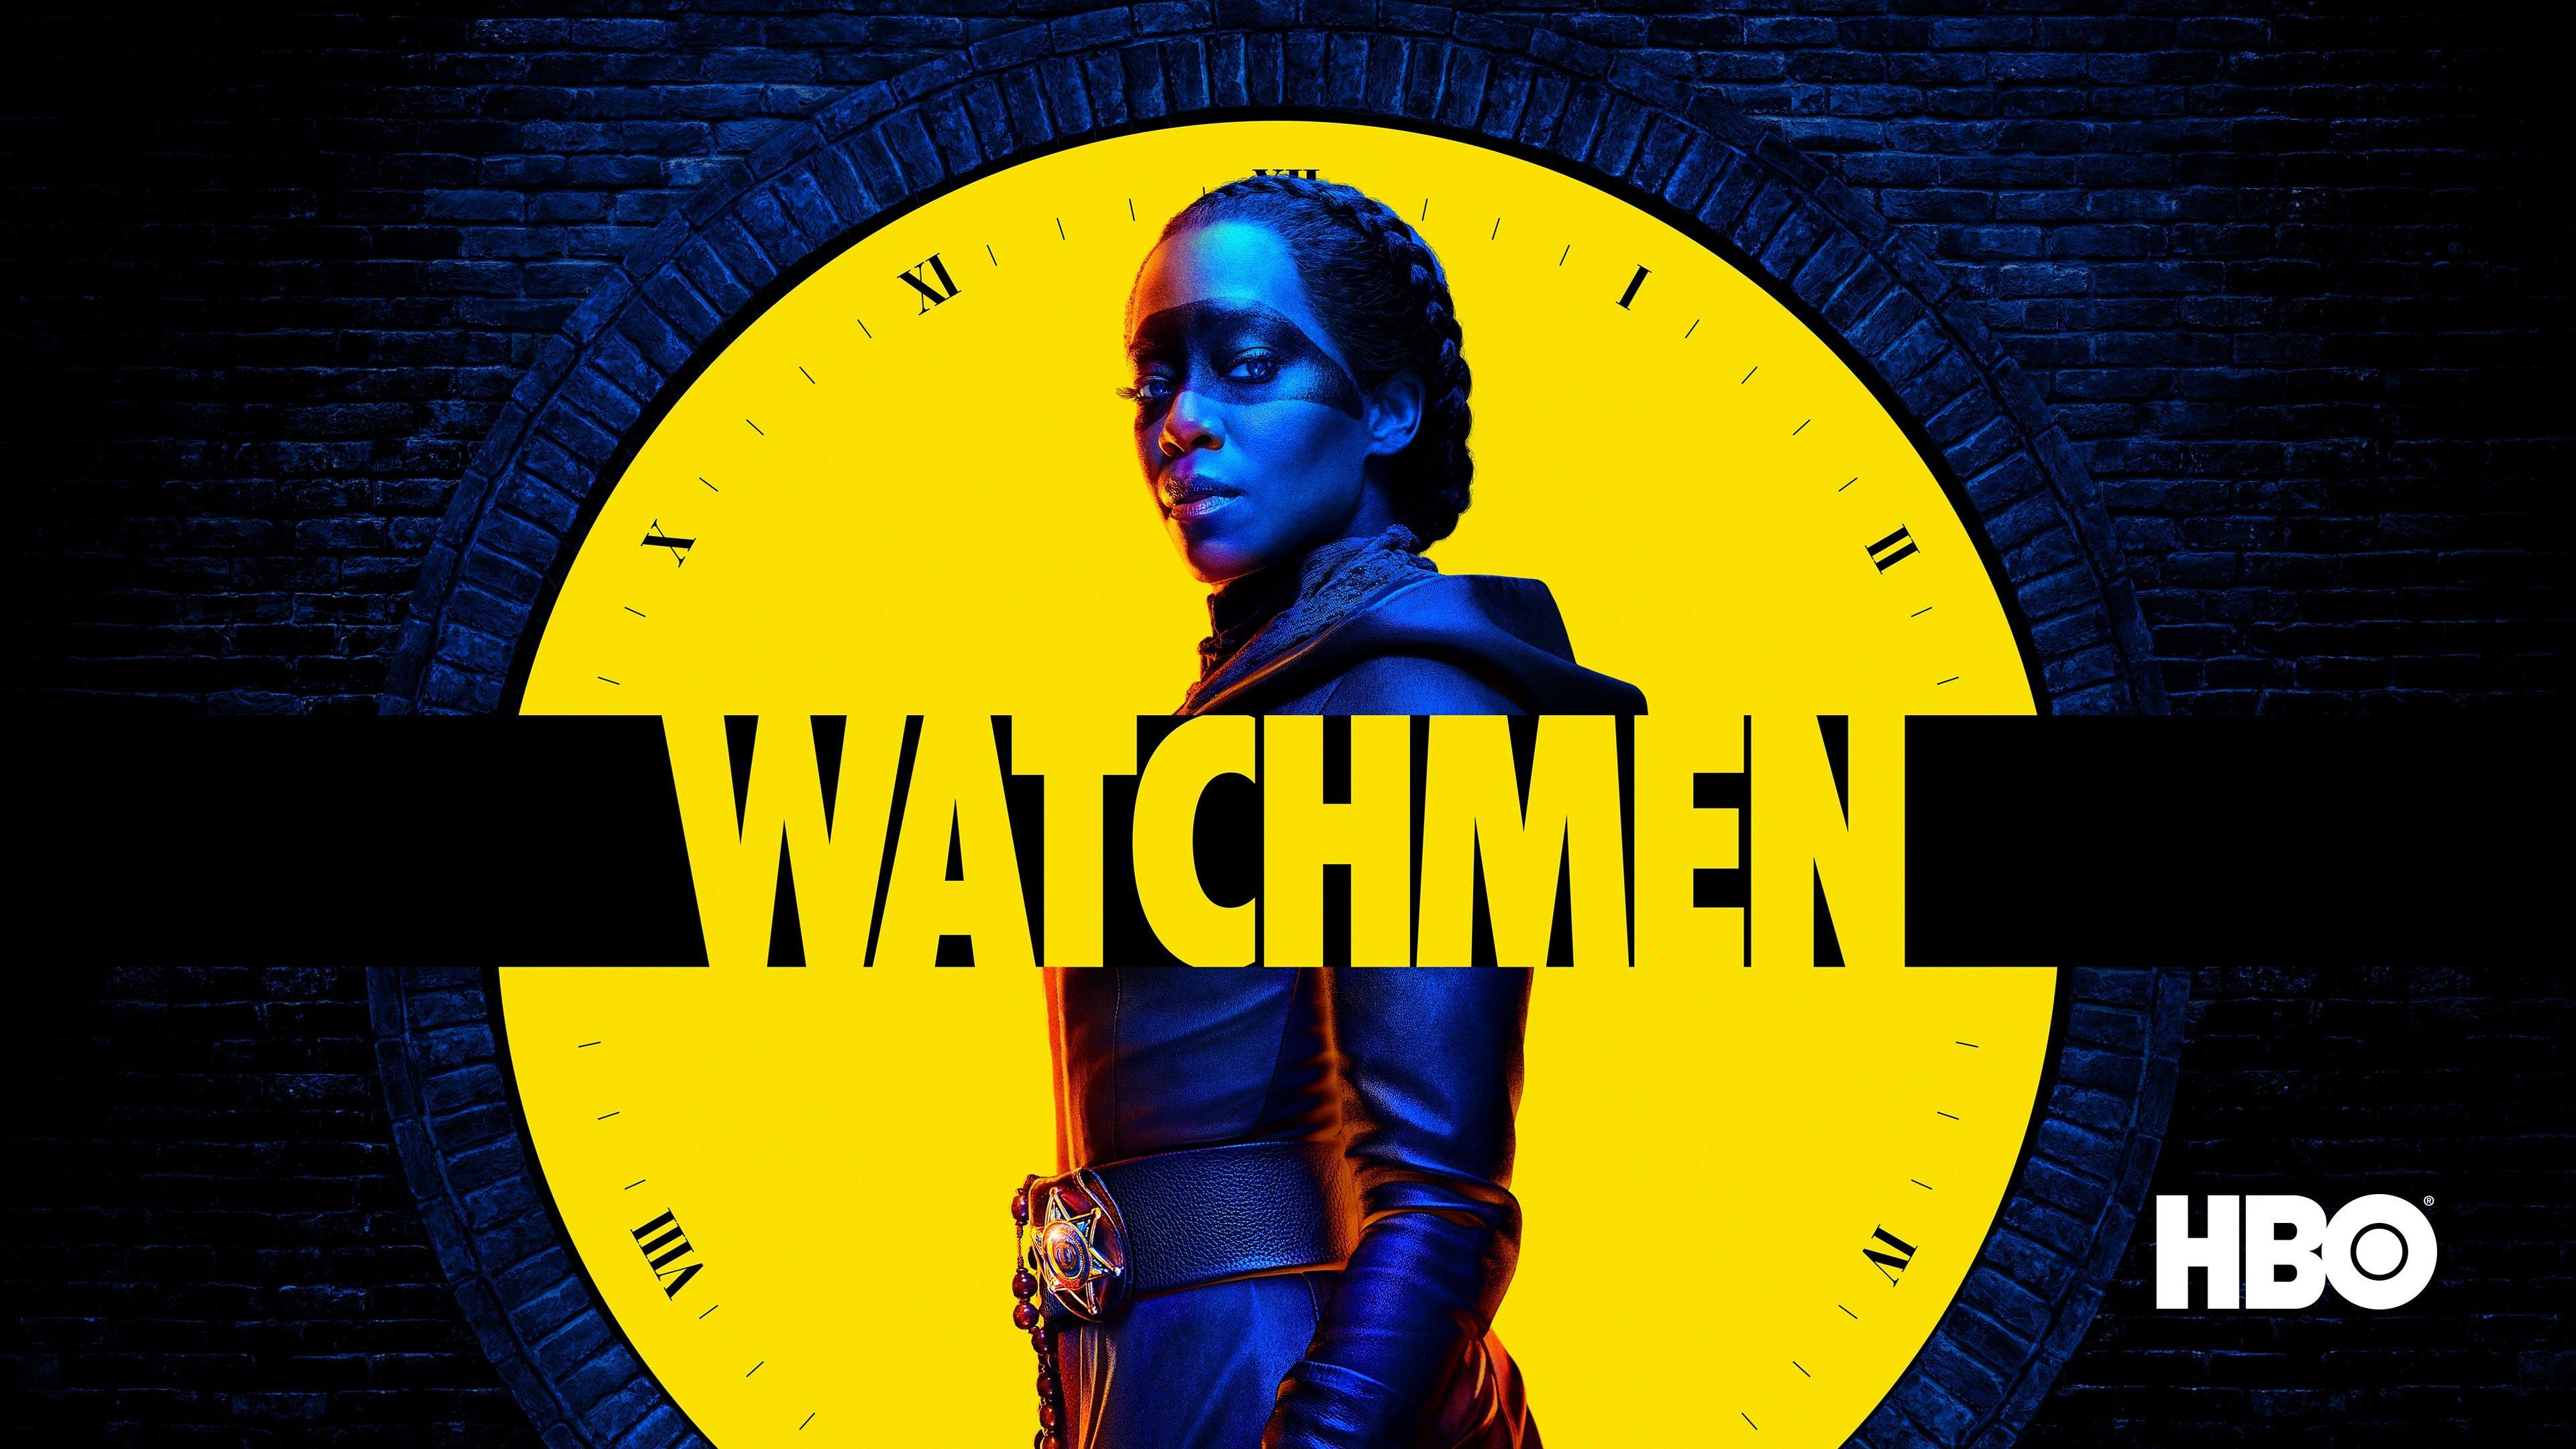 Watchmen - Rotten Tomatoes